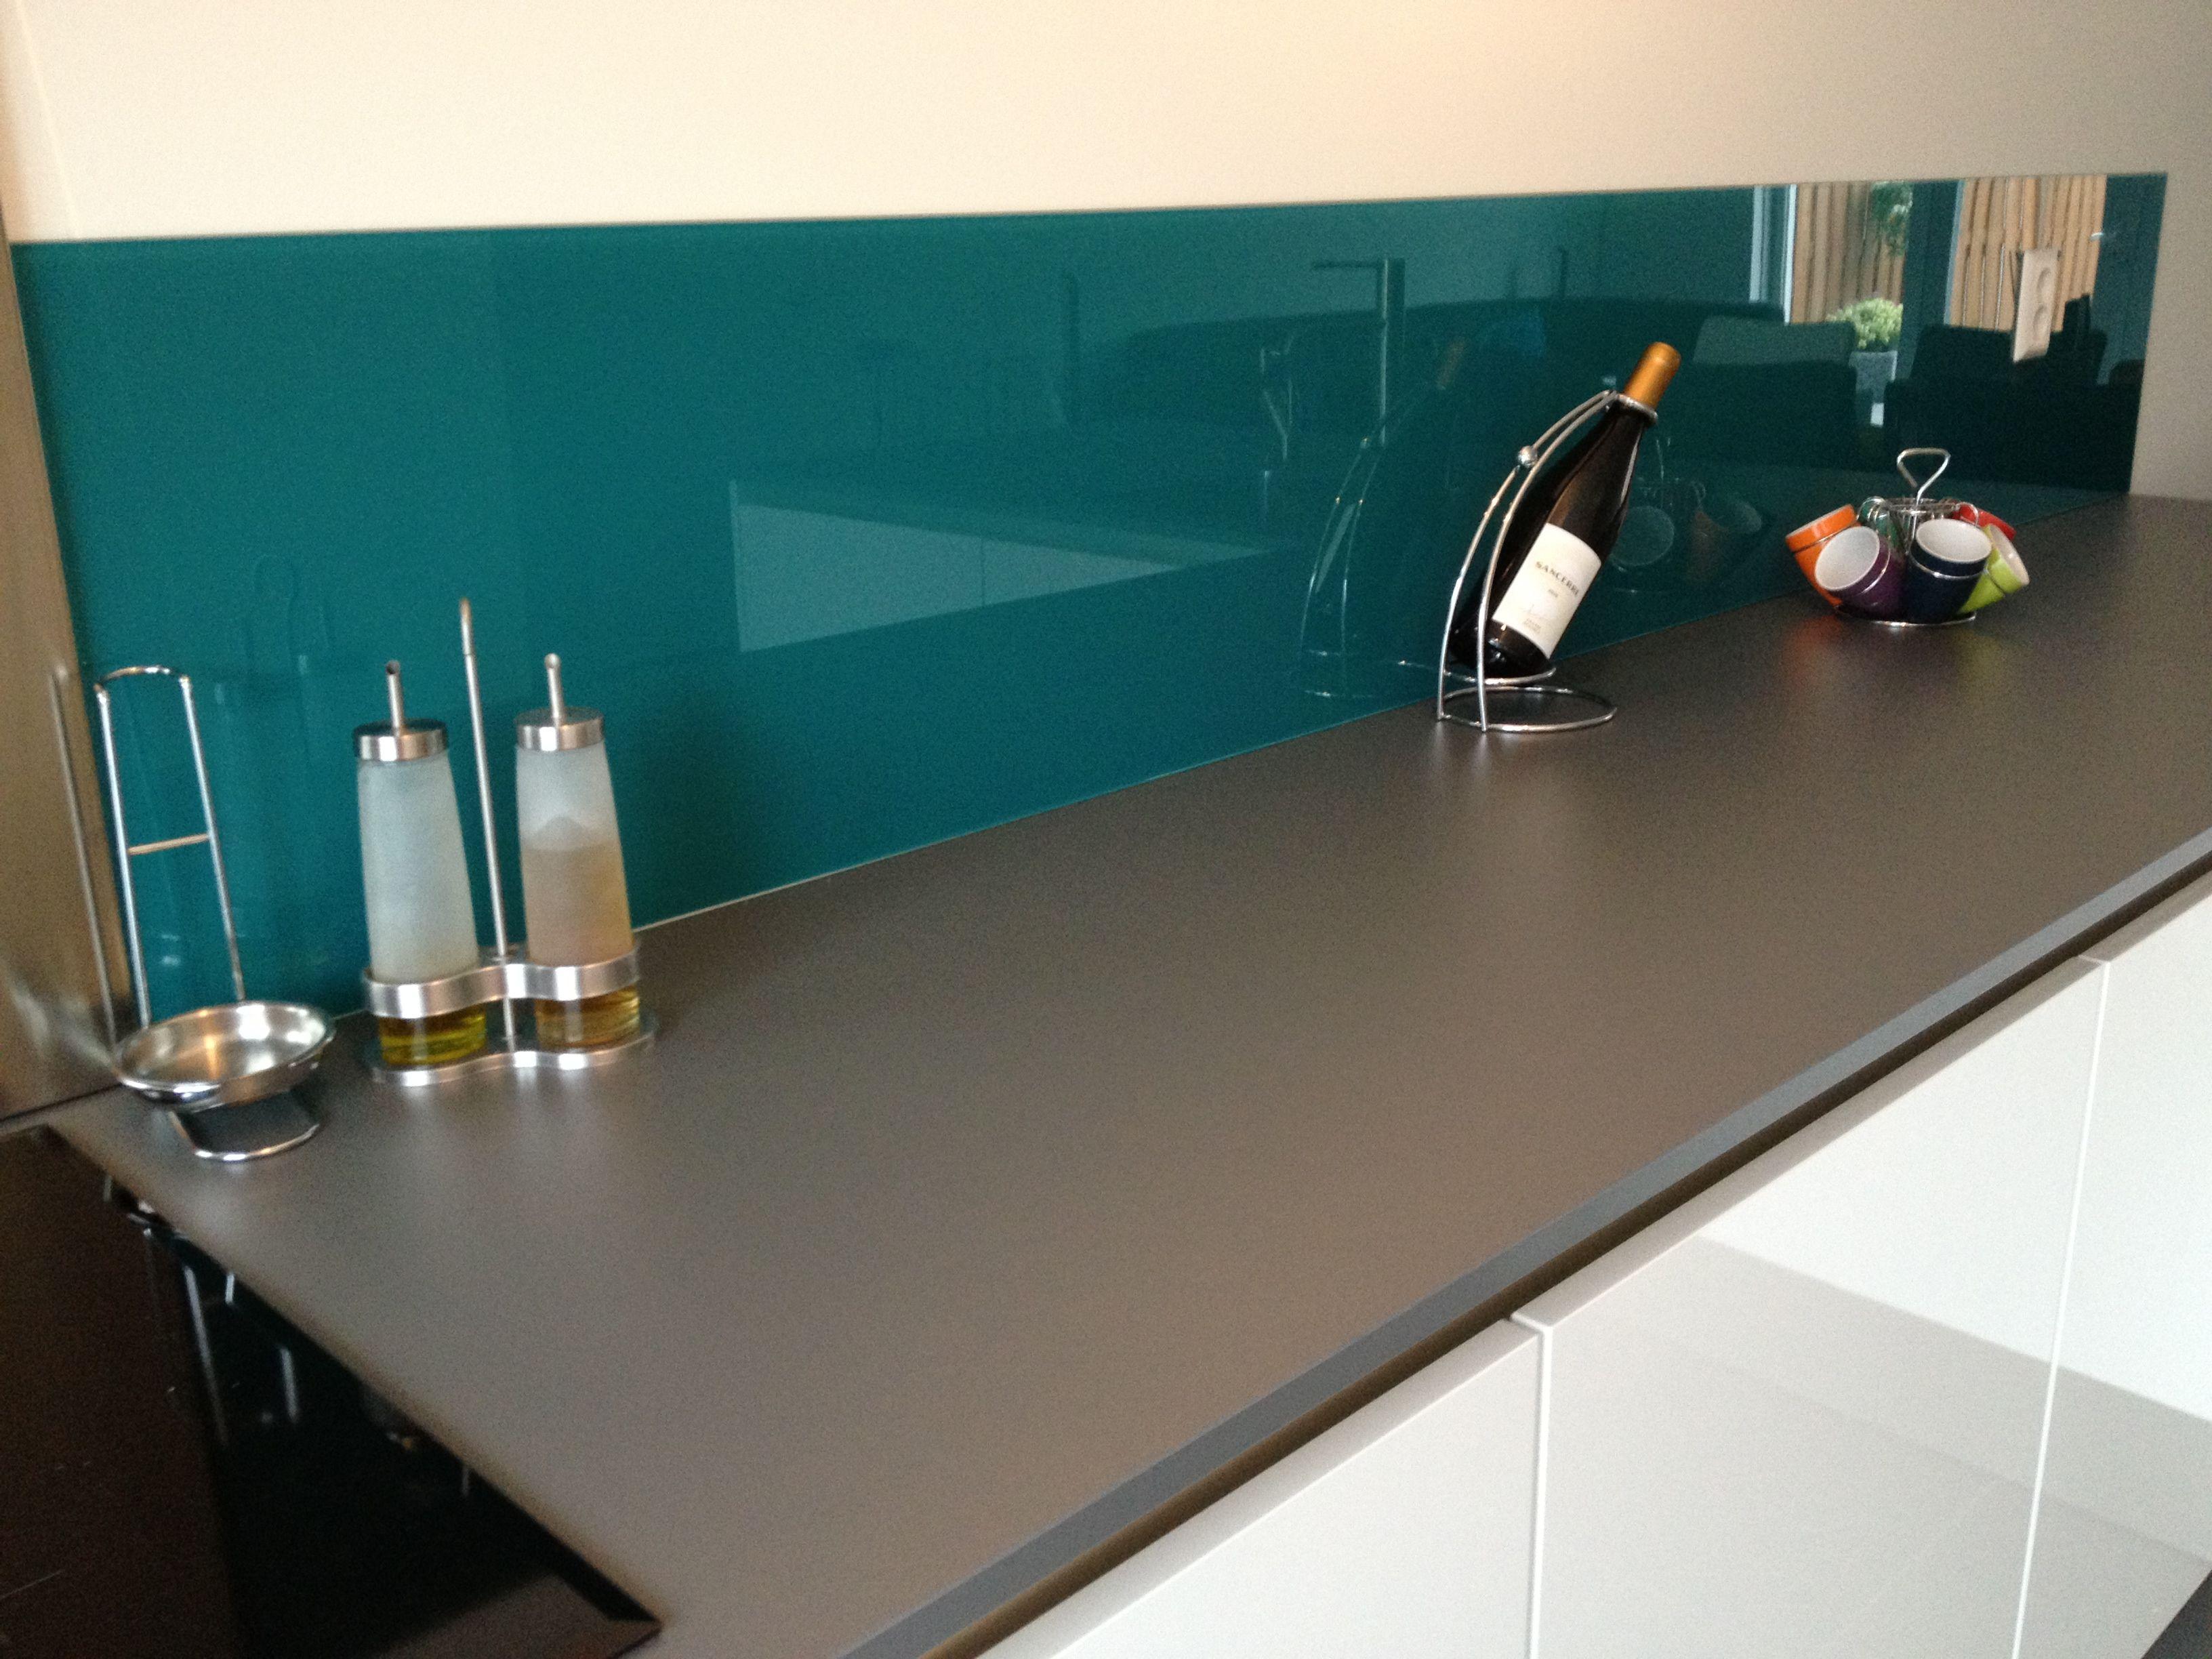 Keukenachterwand van van 6mm hittebestendig for Hittebestendig glas